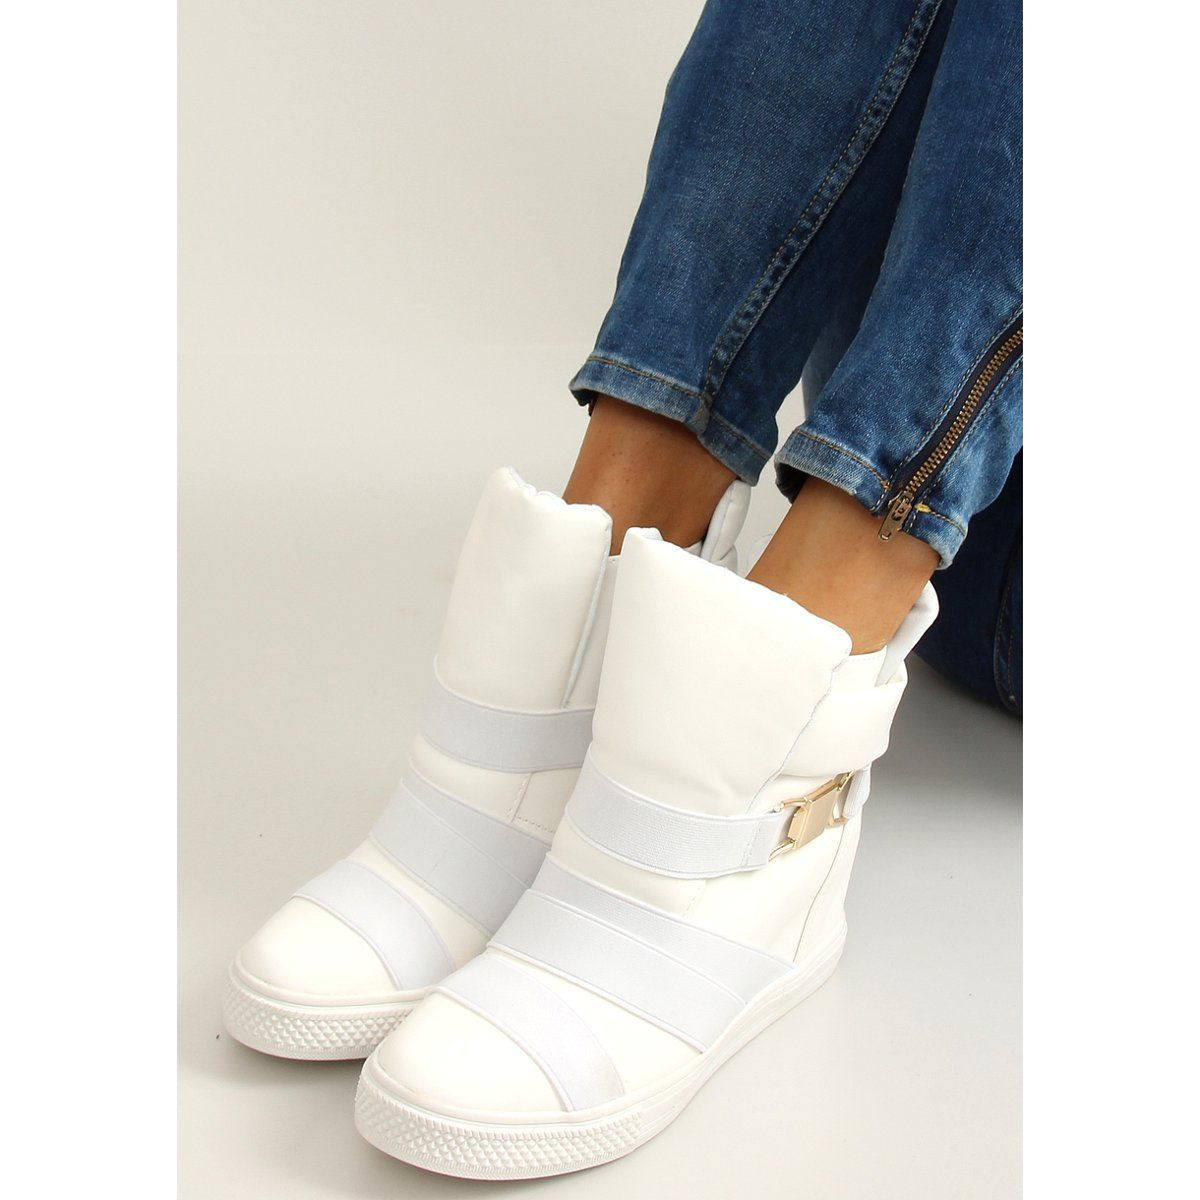 Sneakersy Z Gumowymi Paskami Af24 White Biale Sneakers Stylish Sneakers Sports Women